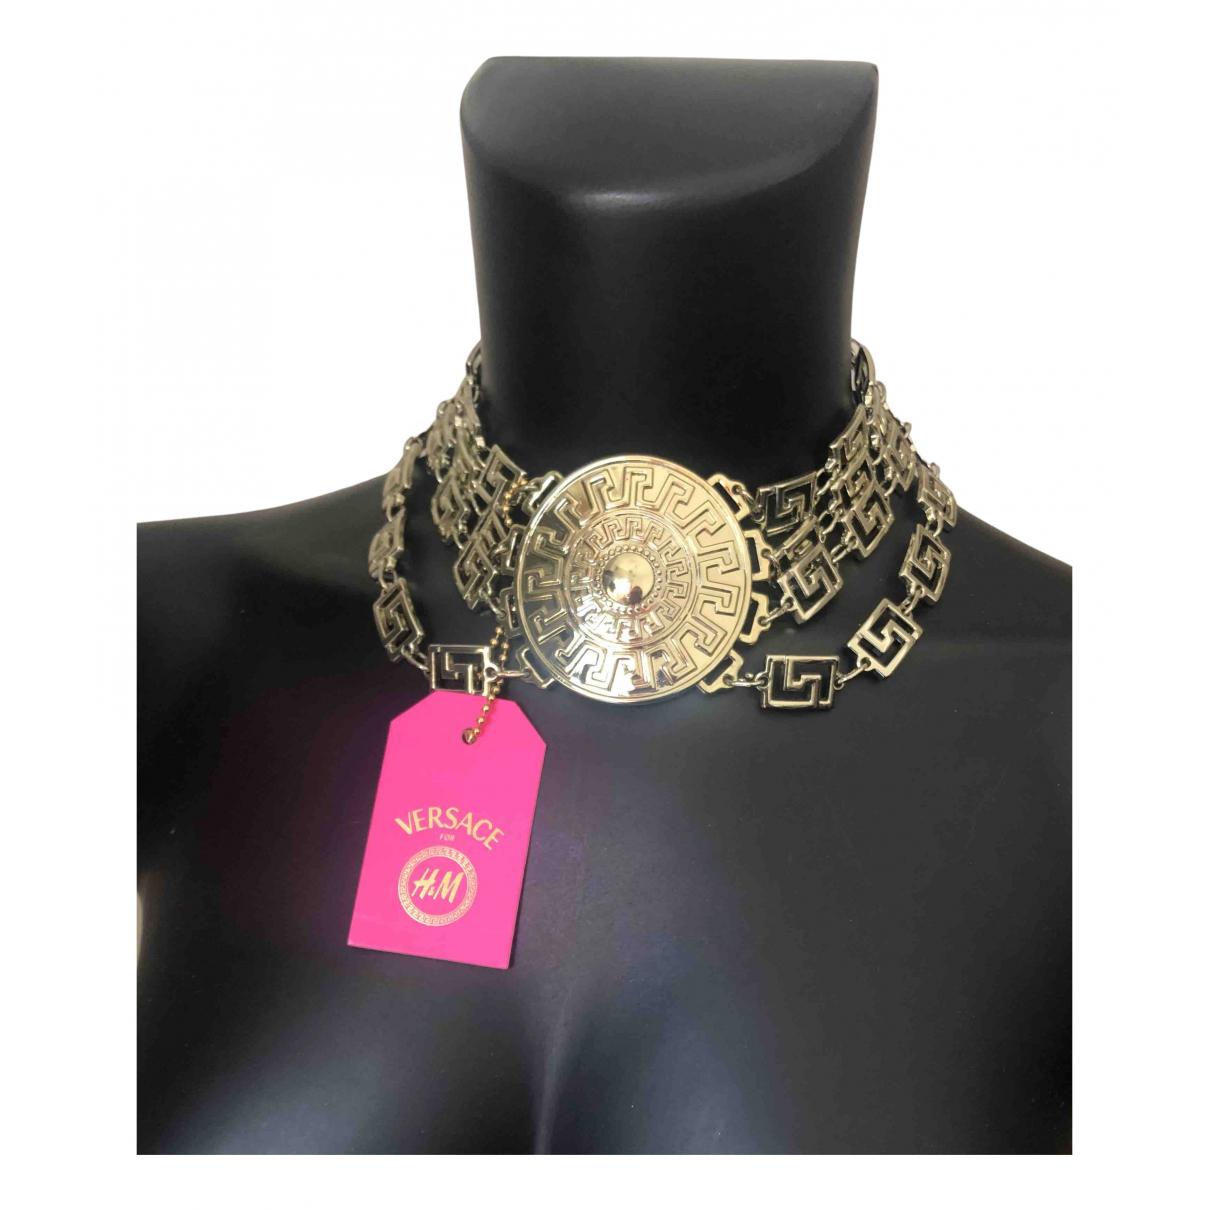 Collar Versace X H&m